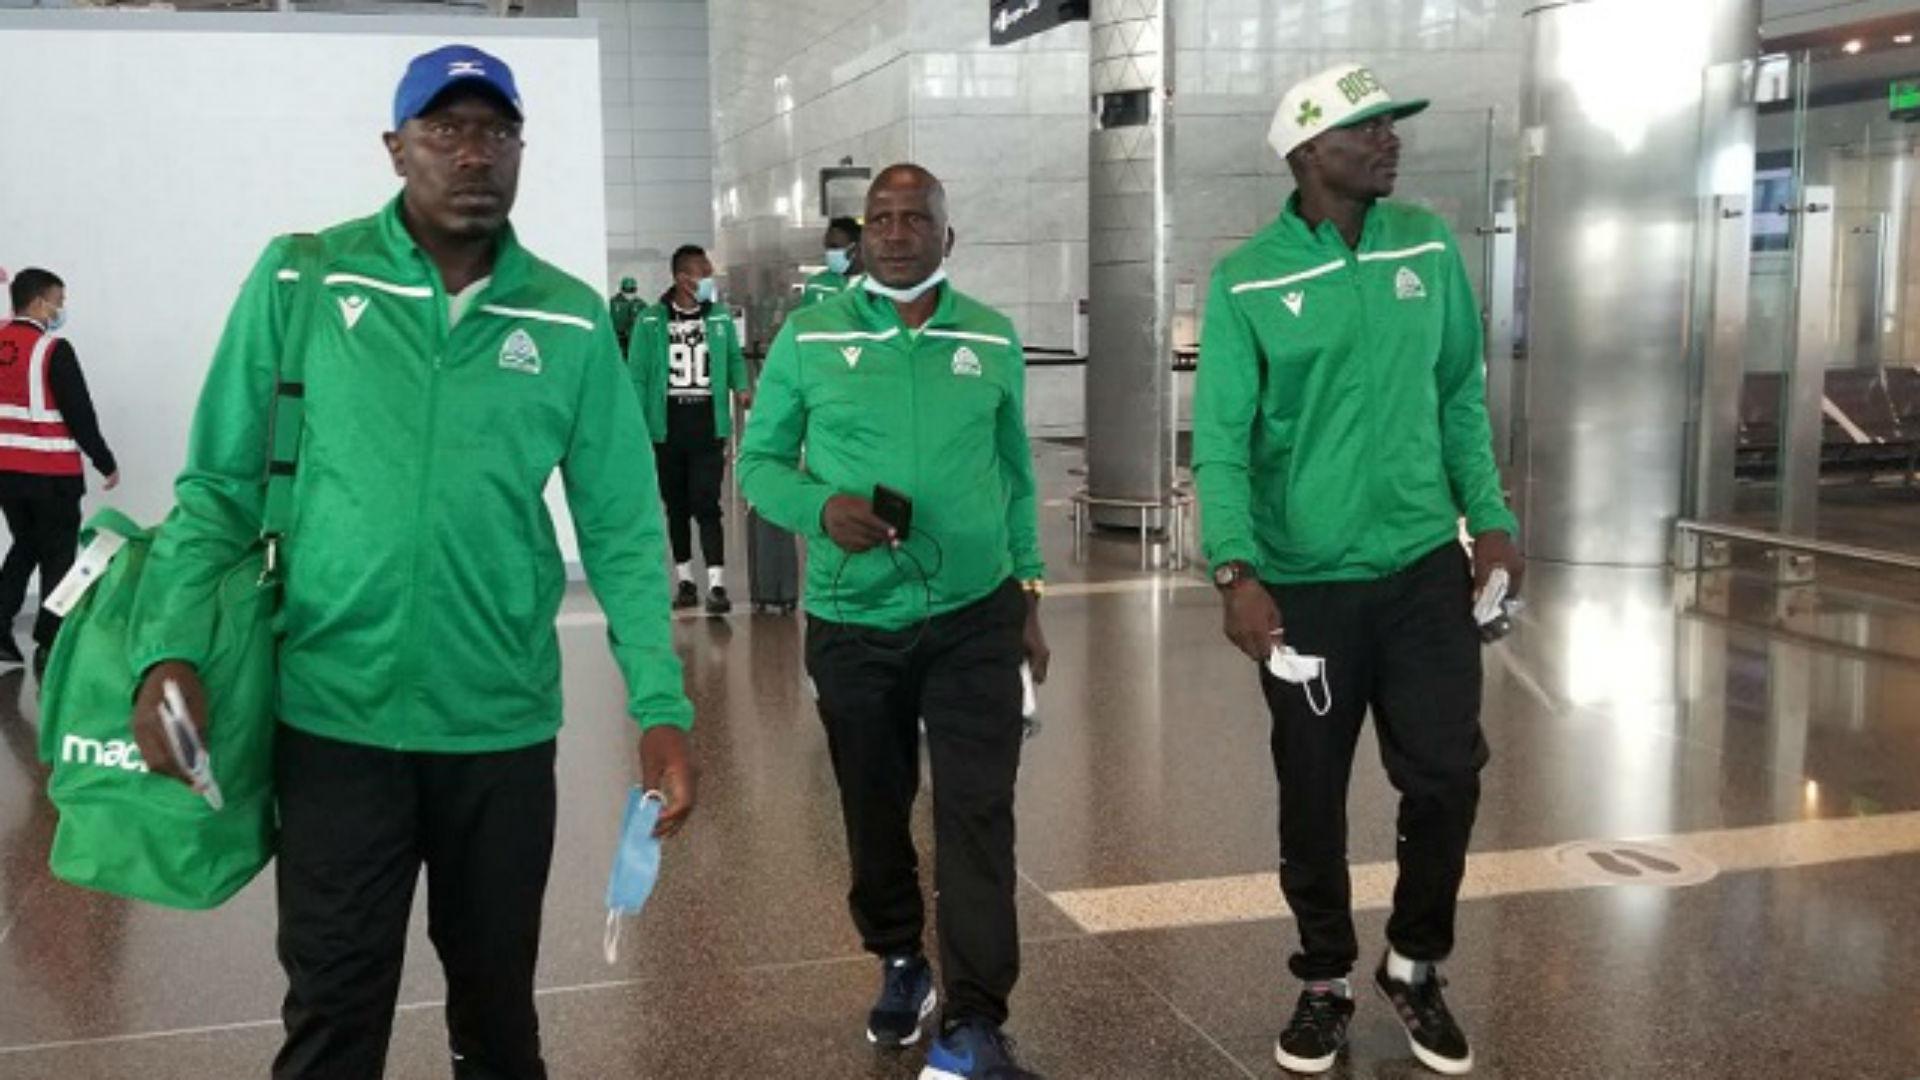 Caf Champions League: Gor Mahia arrive in Algeria ahead of CR Belouizdad game